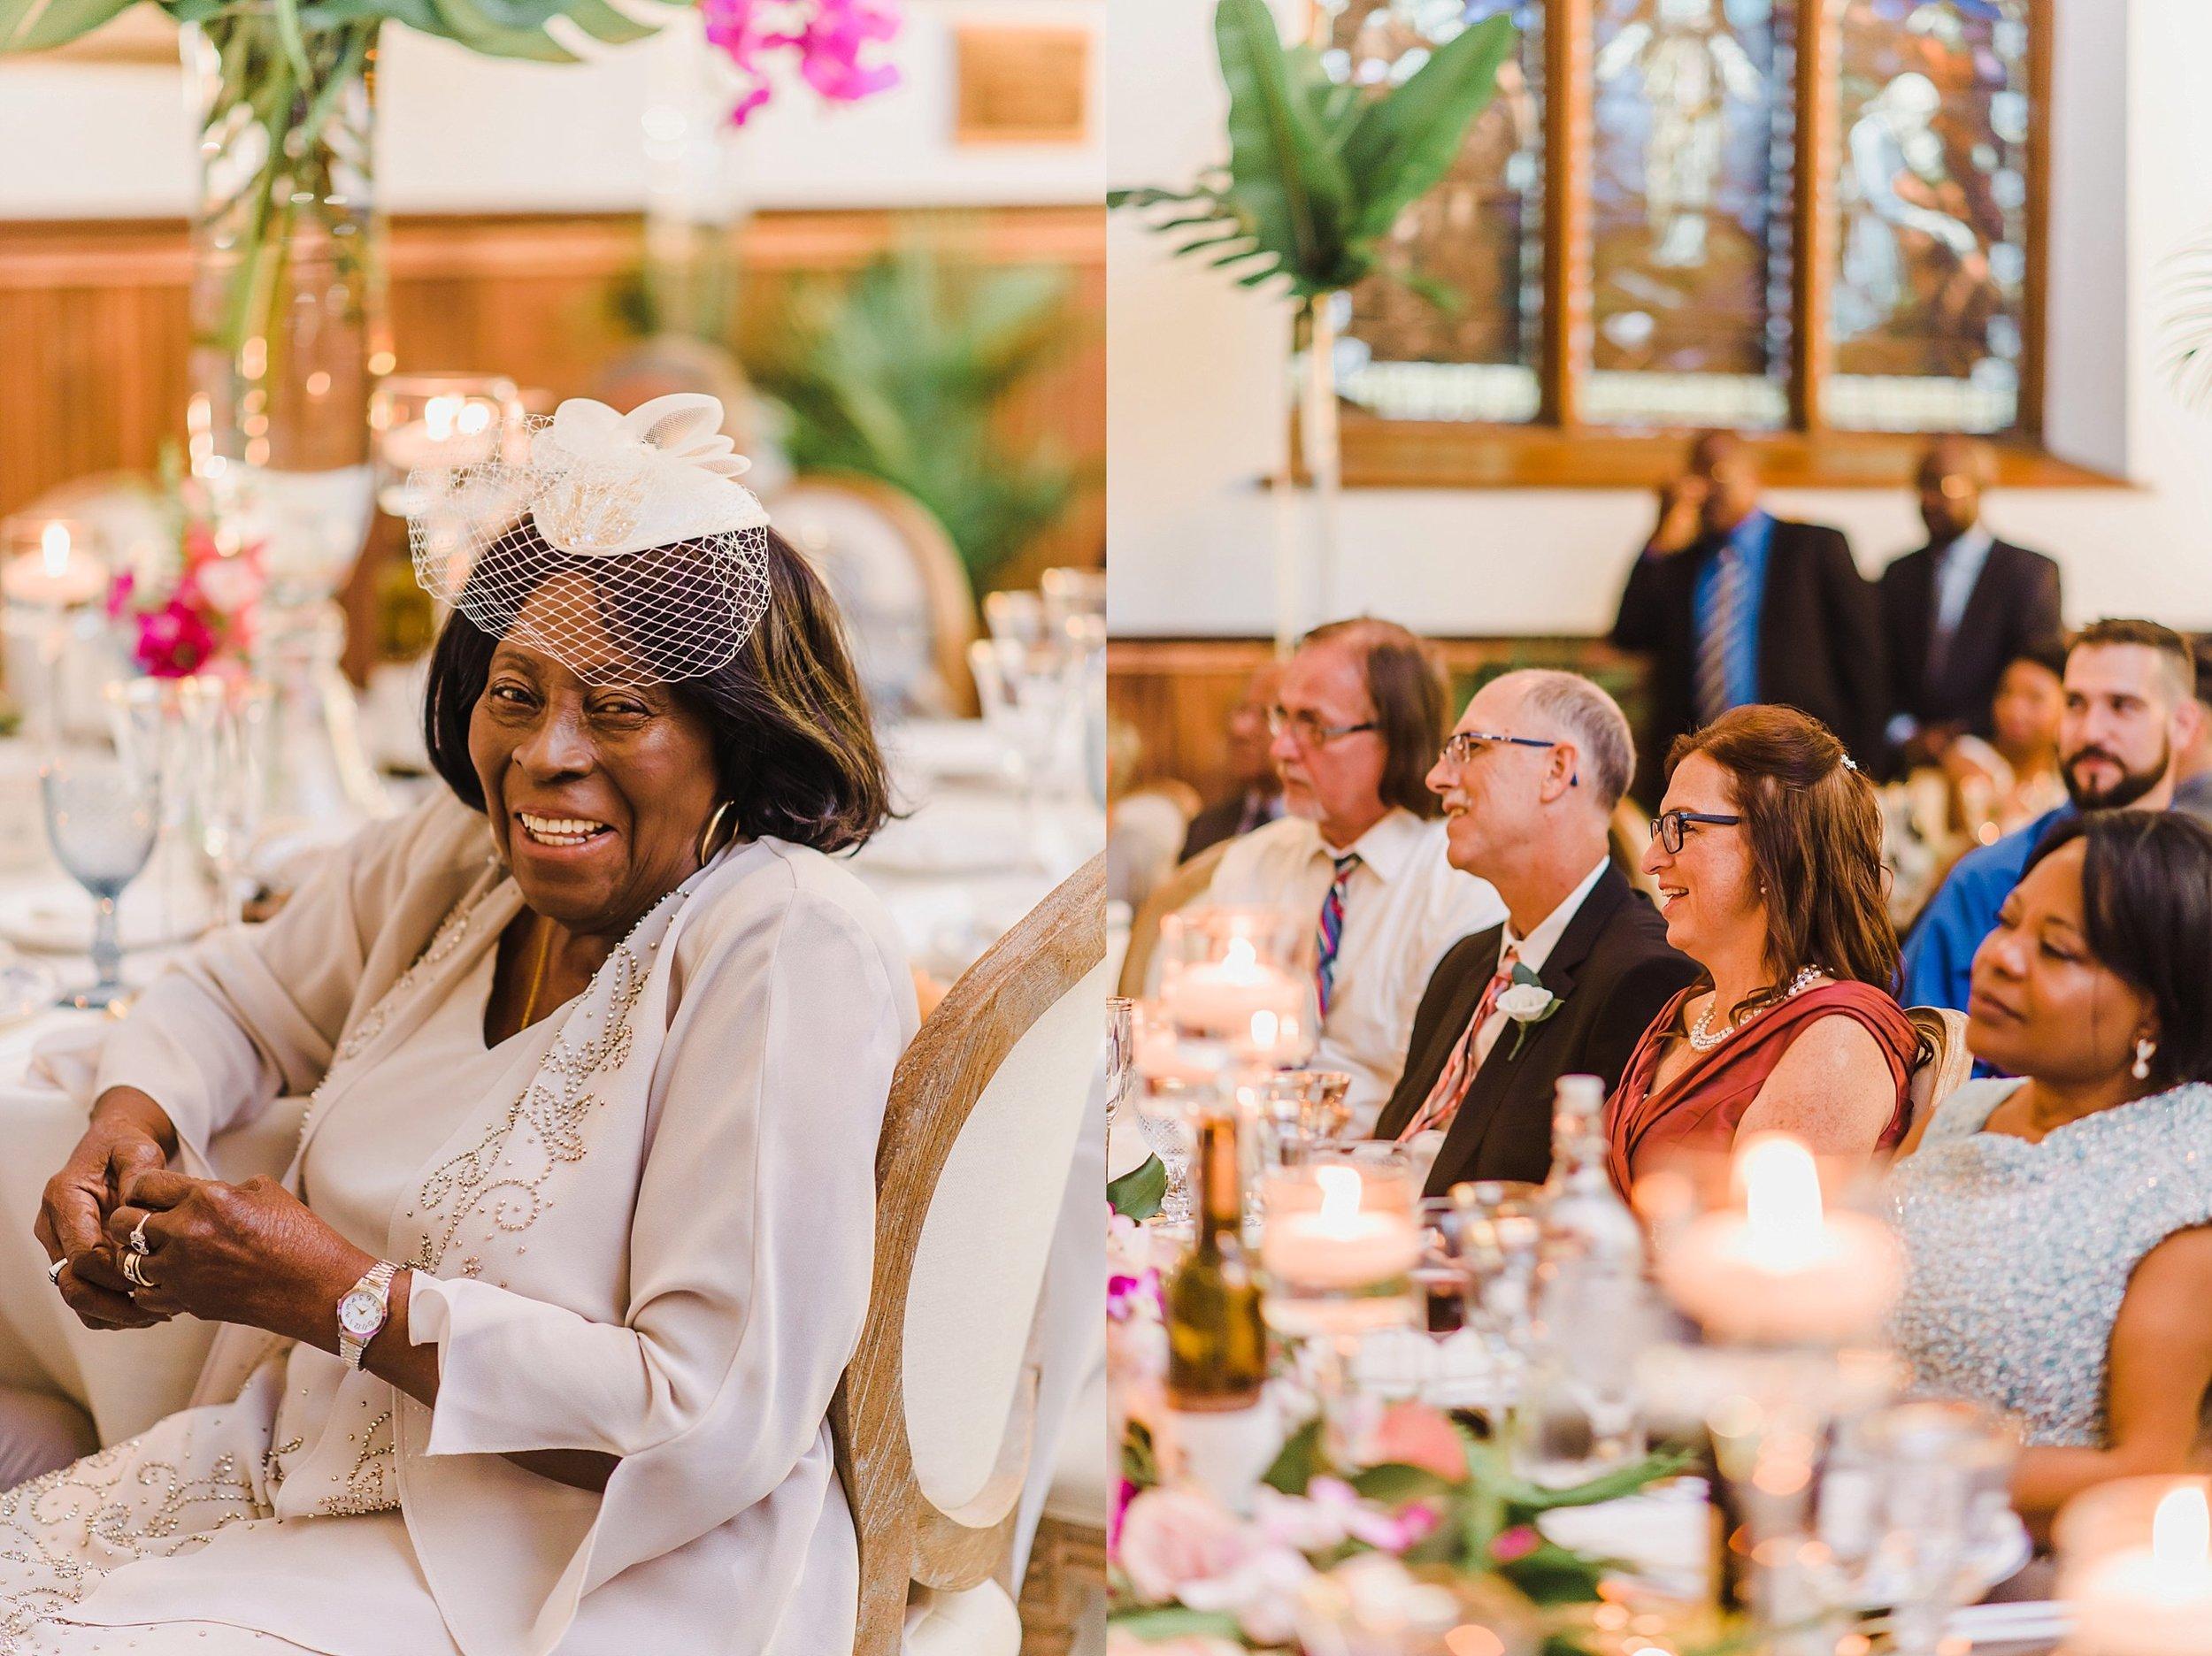 light airy indie fine art ottawa wedding photographer | Ali and Batoul Photography_1042.jpg